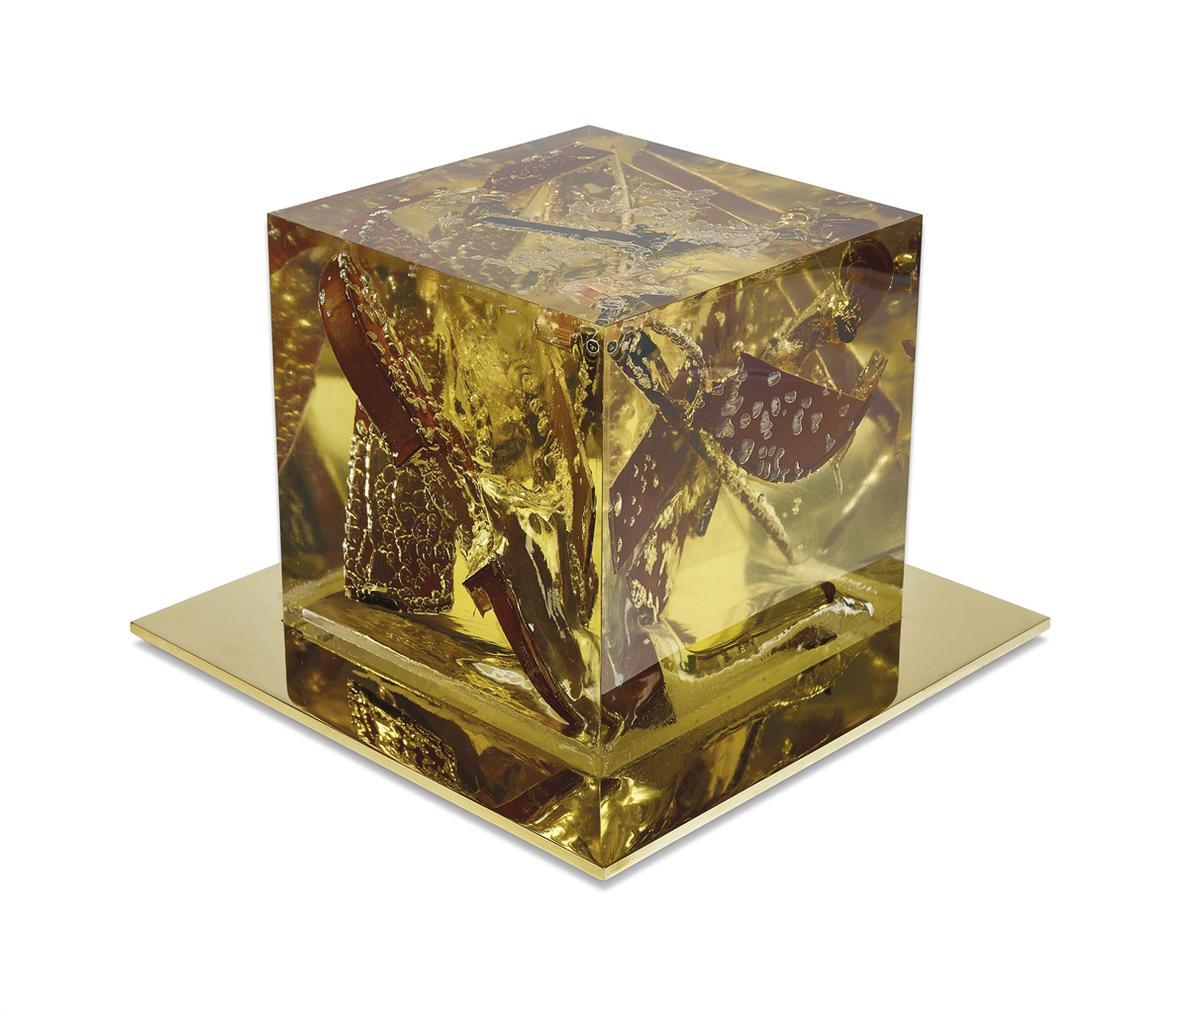 Arman-Colere En Cube-1971